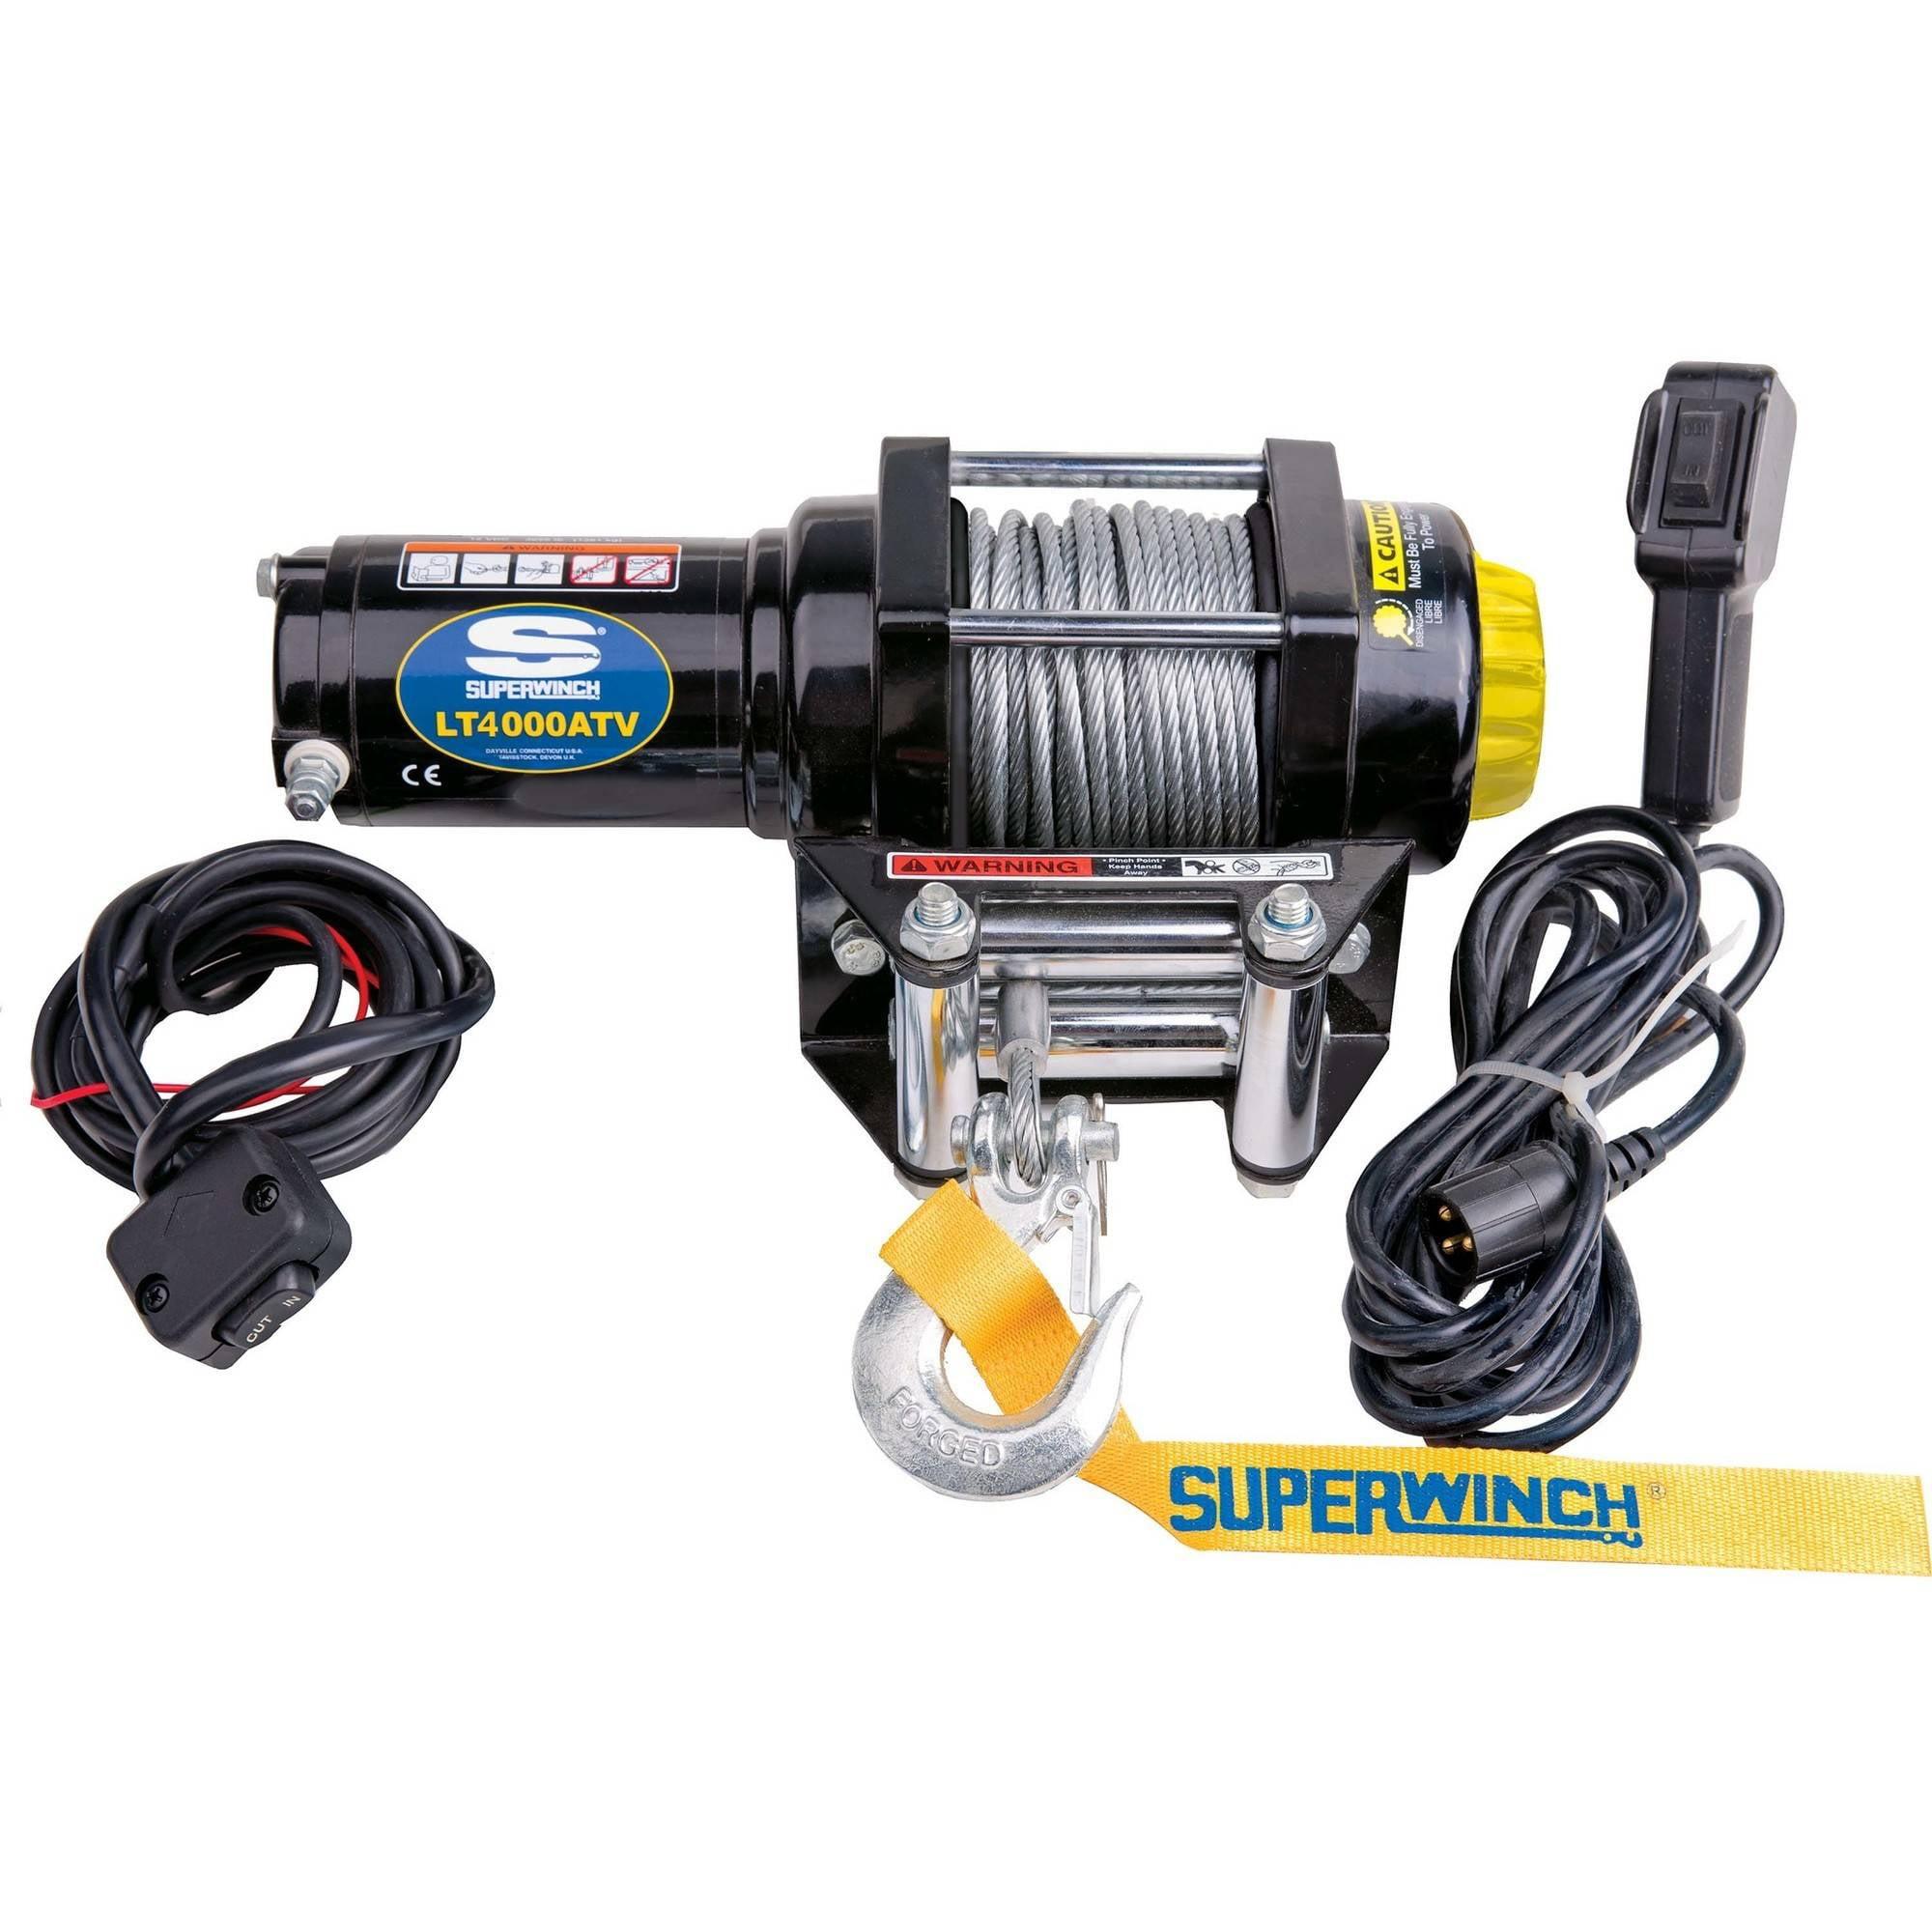 Superwinch 1140220 LT4000 ATV Winch, Black by Superwinch